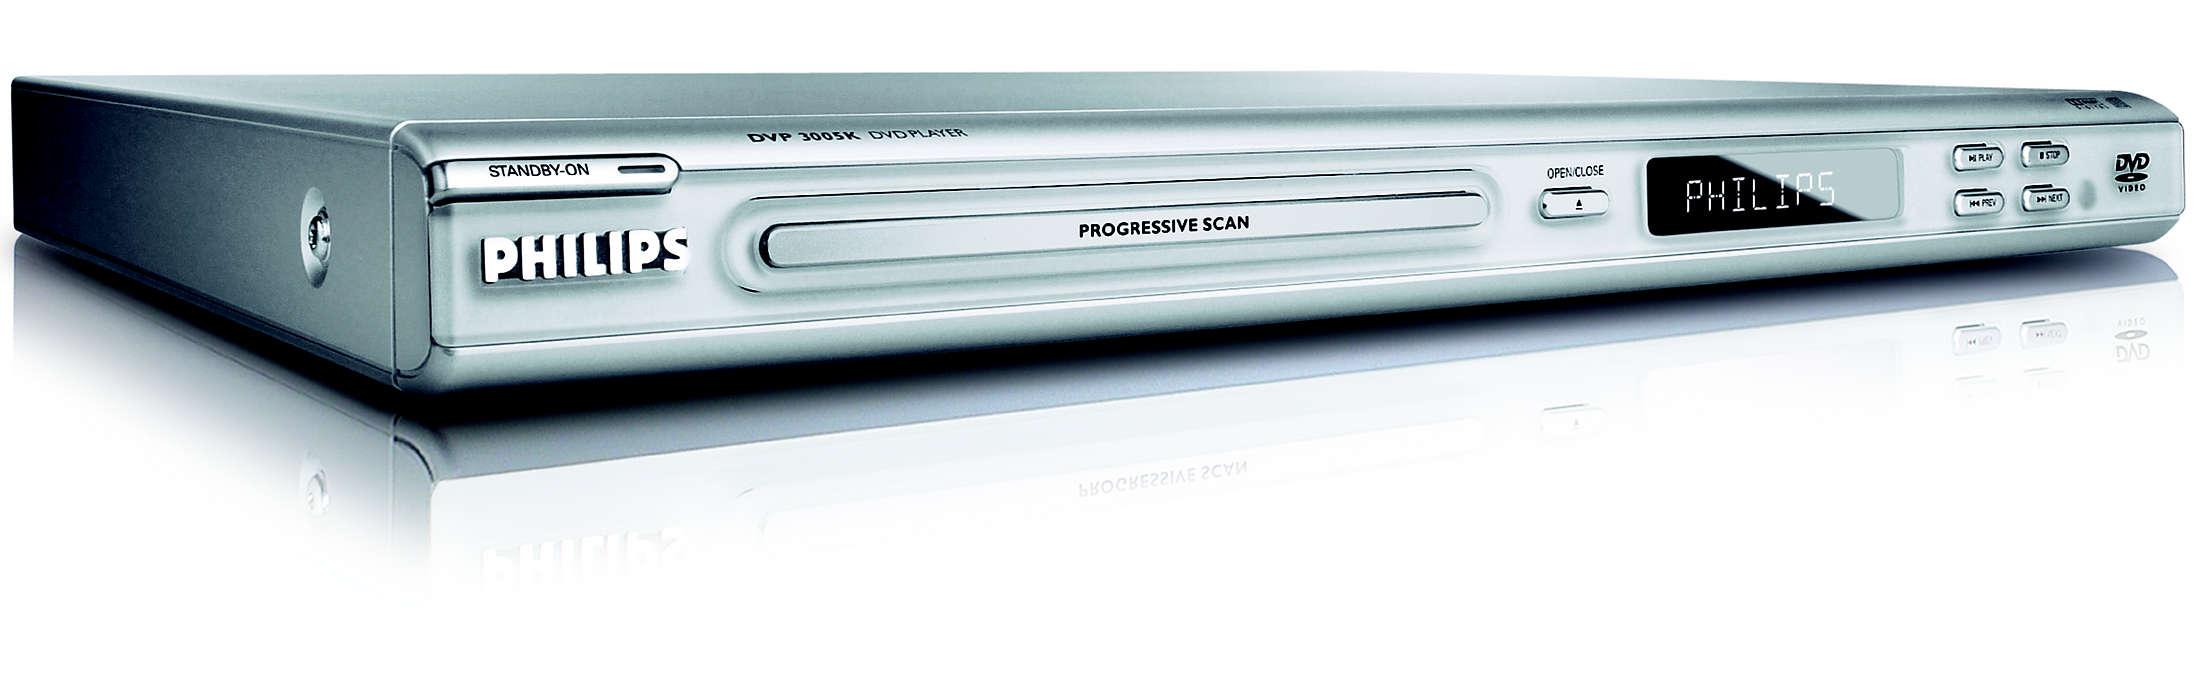 DVD player DVP3005K/69   Philips